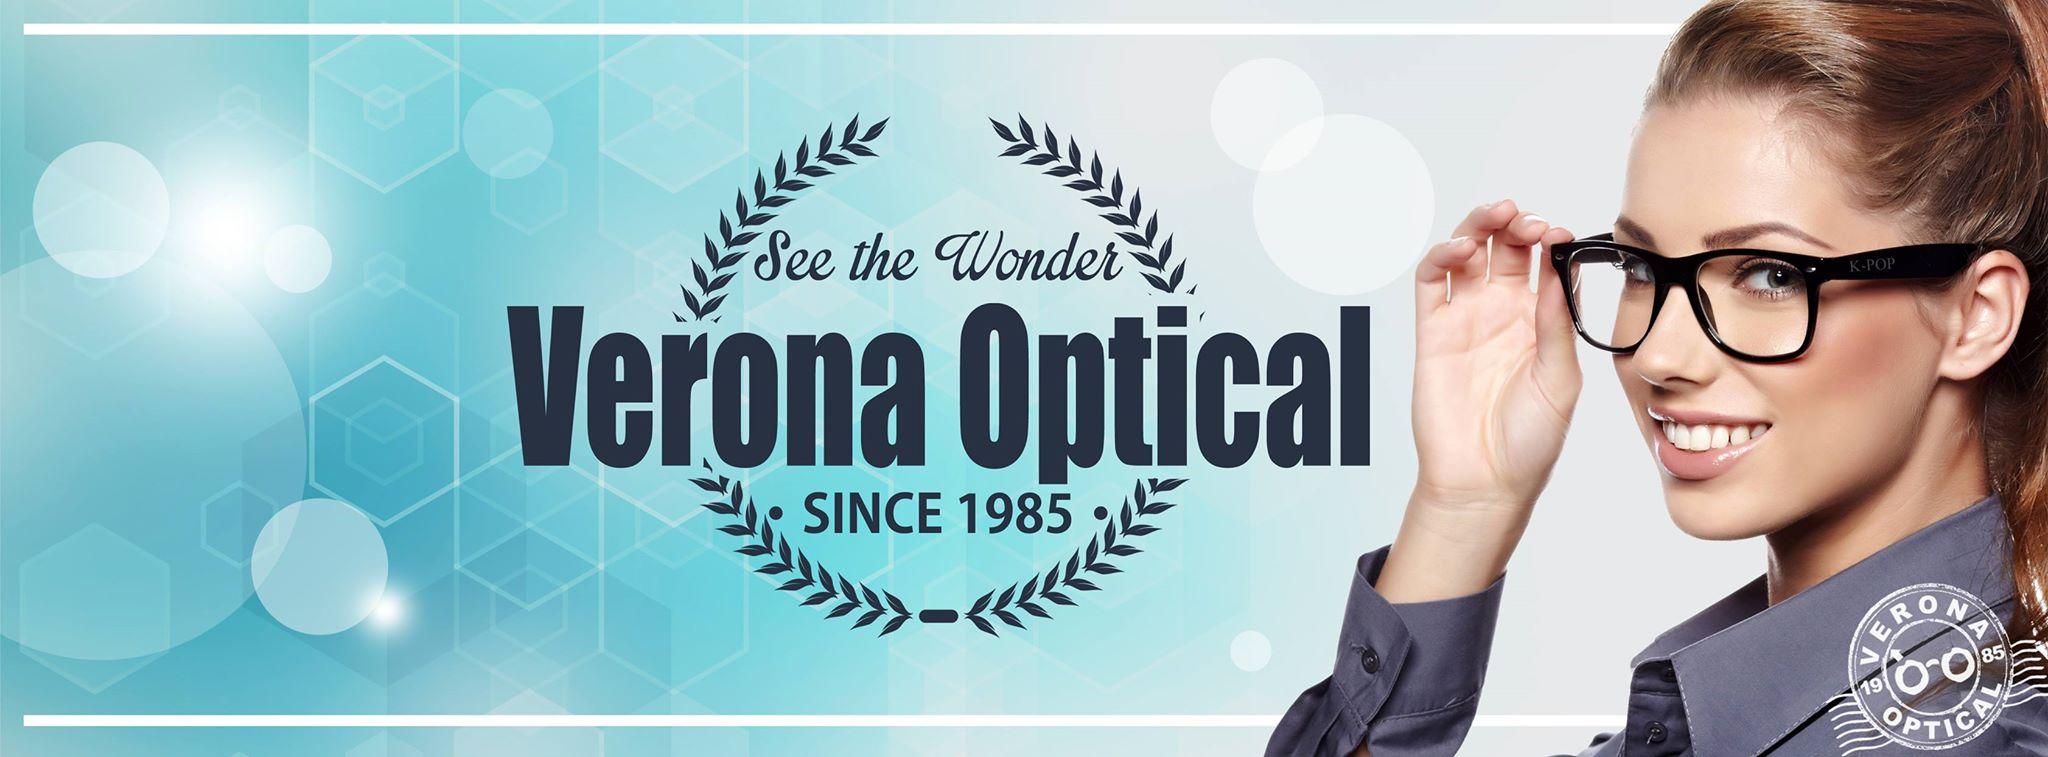 Verona Optical